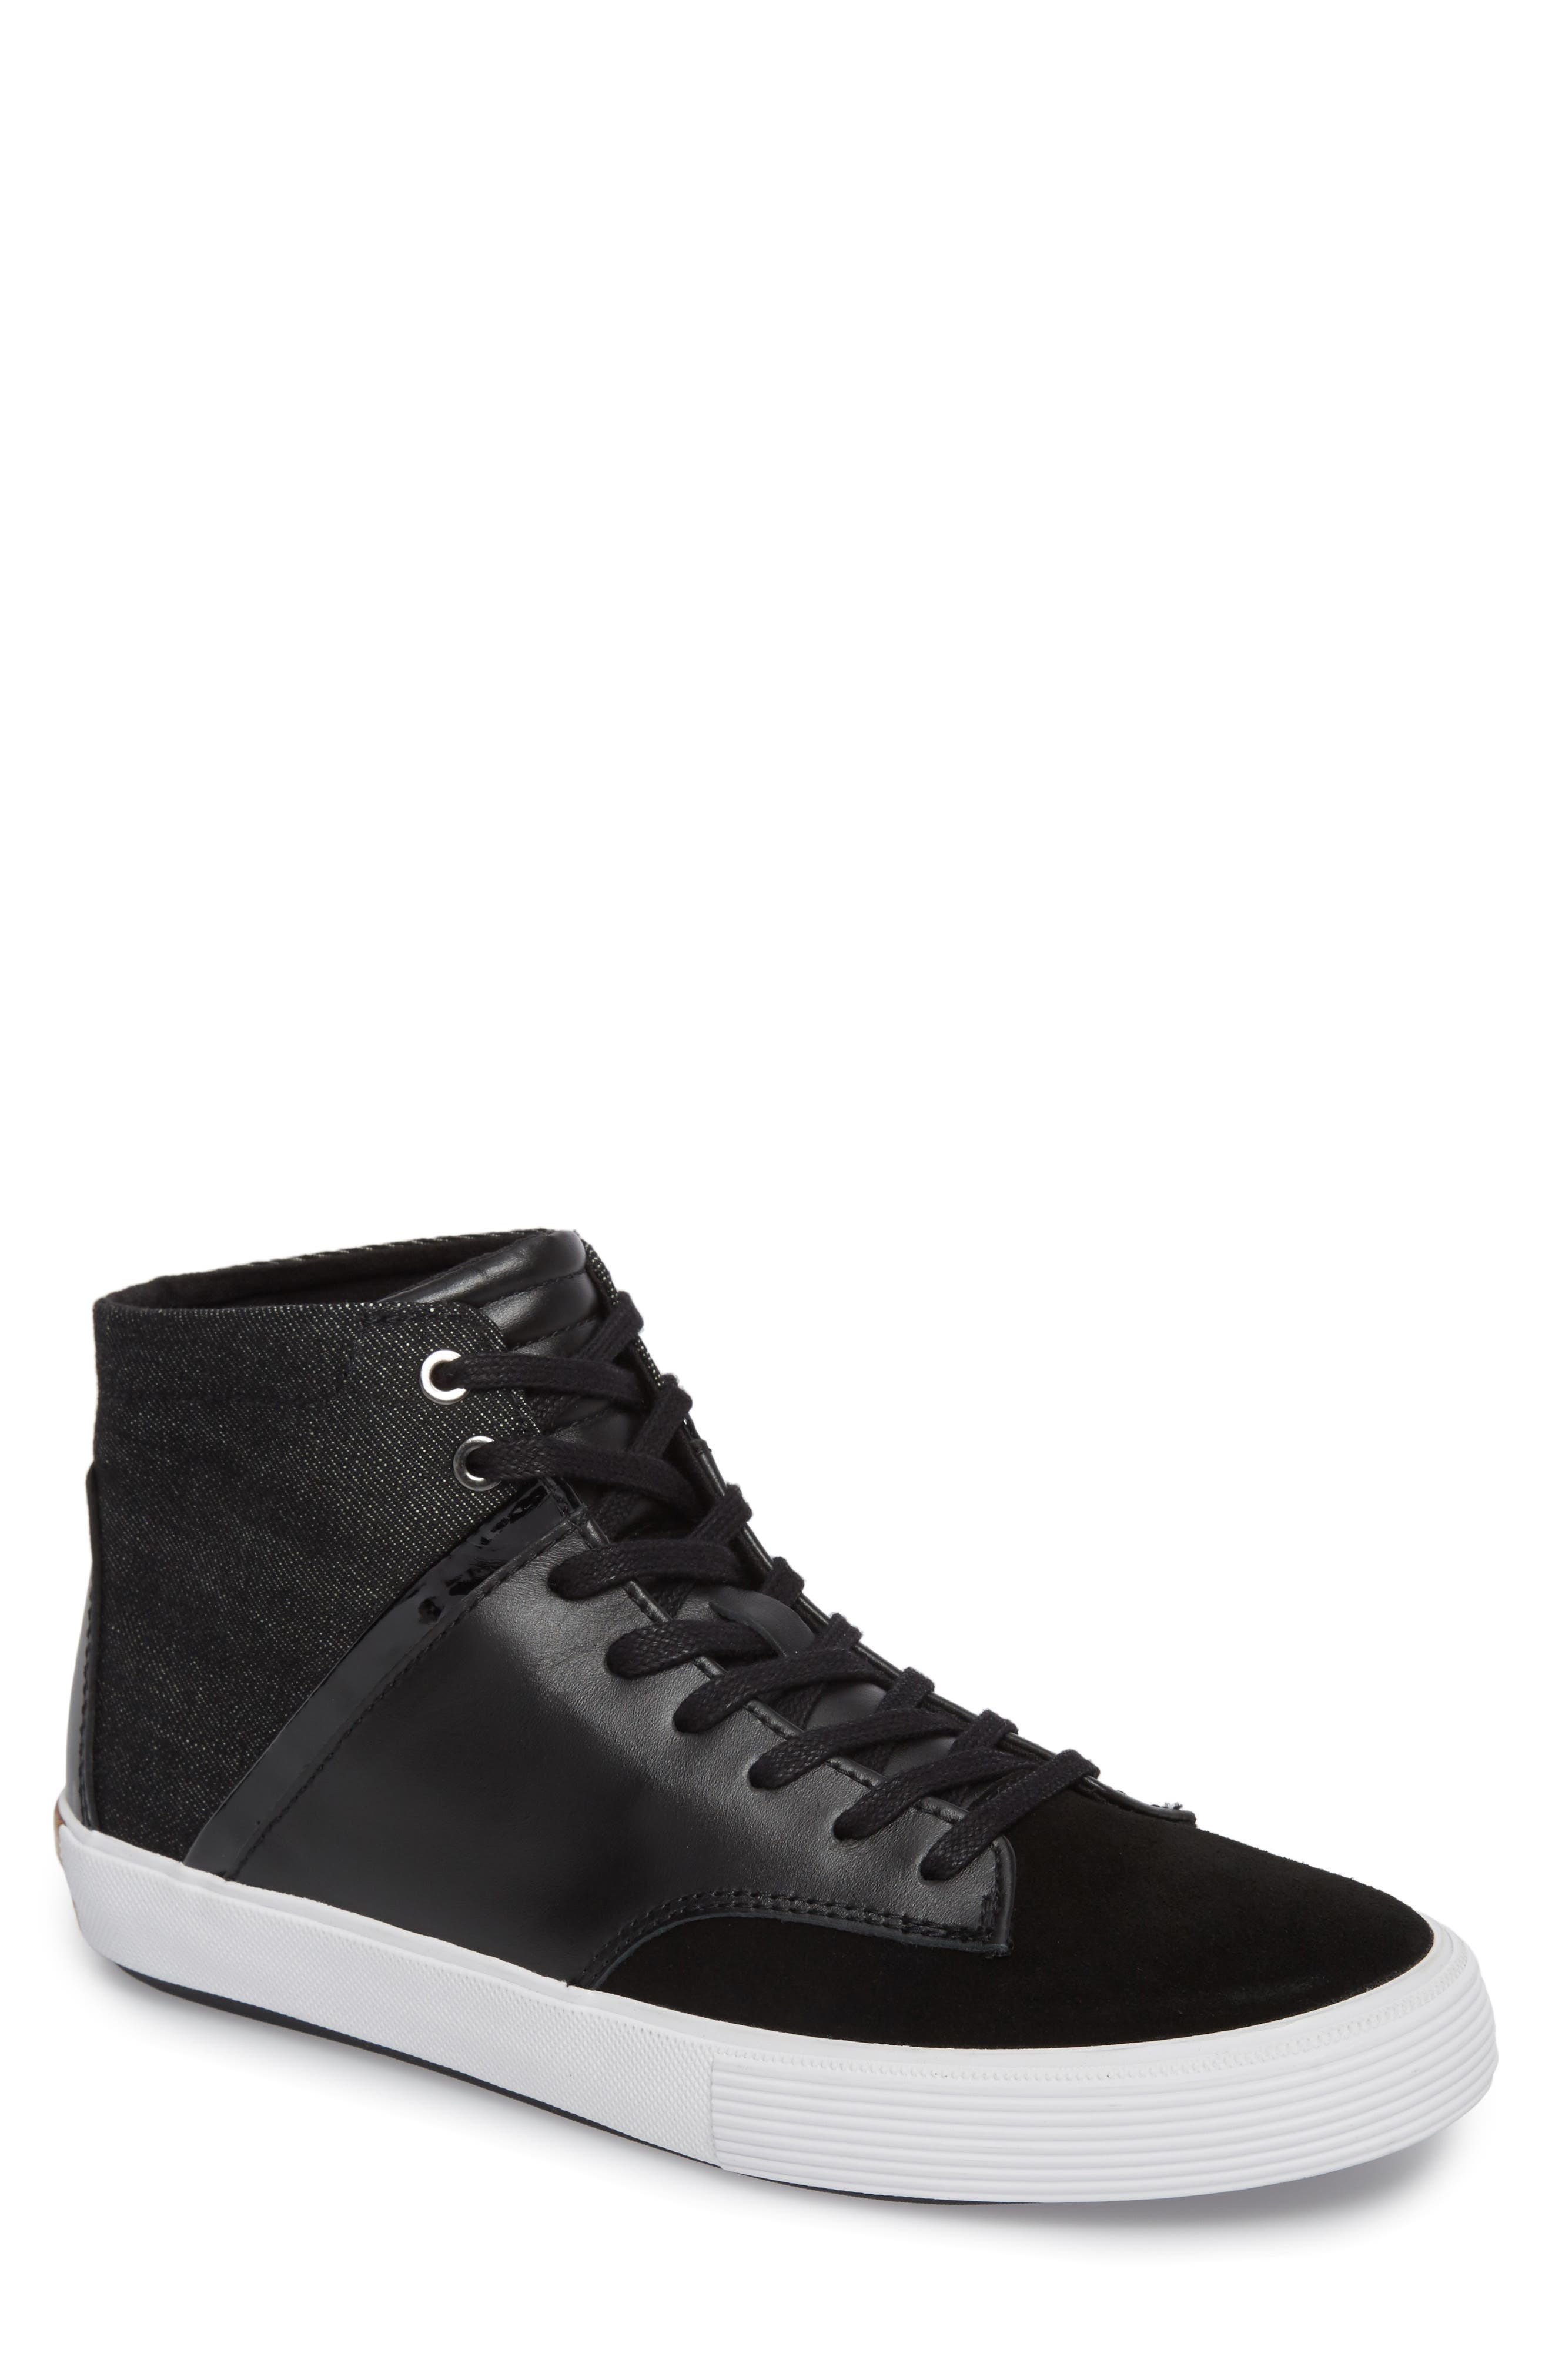 Joe Mac High Top Sneaker,                         Main,                         color, Black Leather